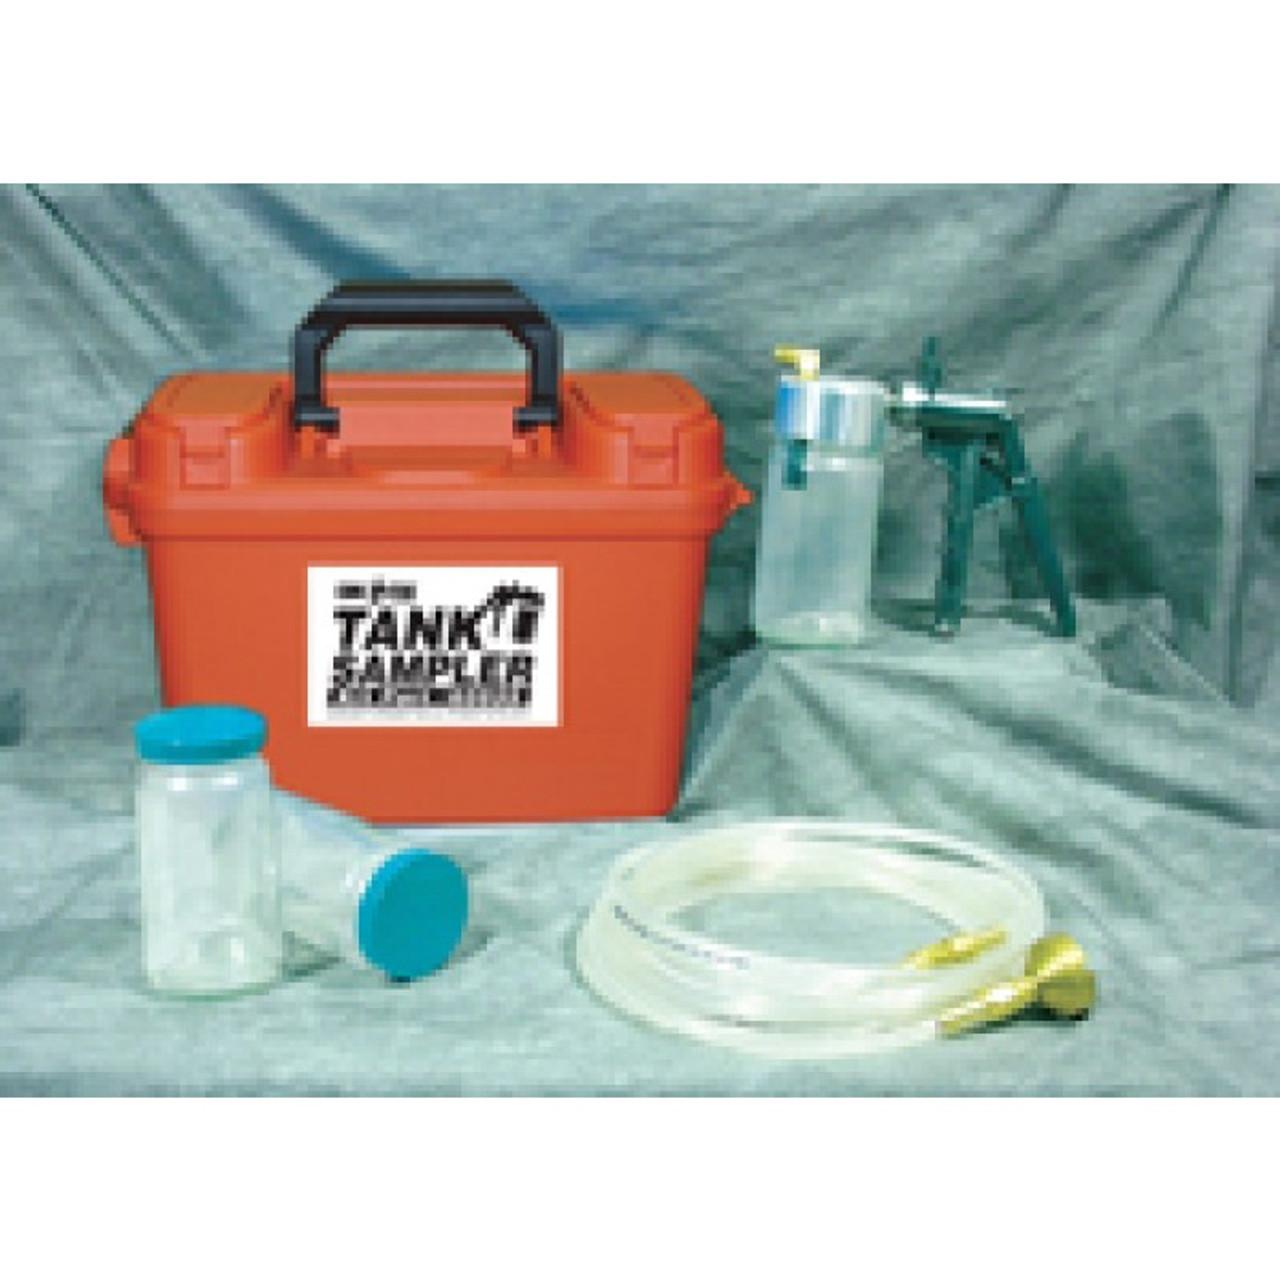 90220 - 3x Lids for Shatter-Proof Jars of Tank Sampler Kit